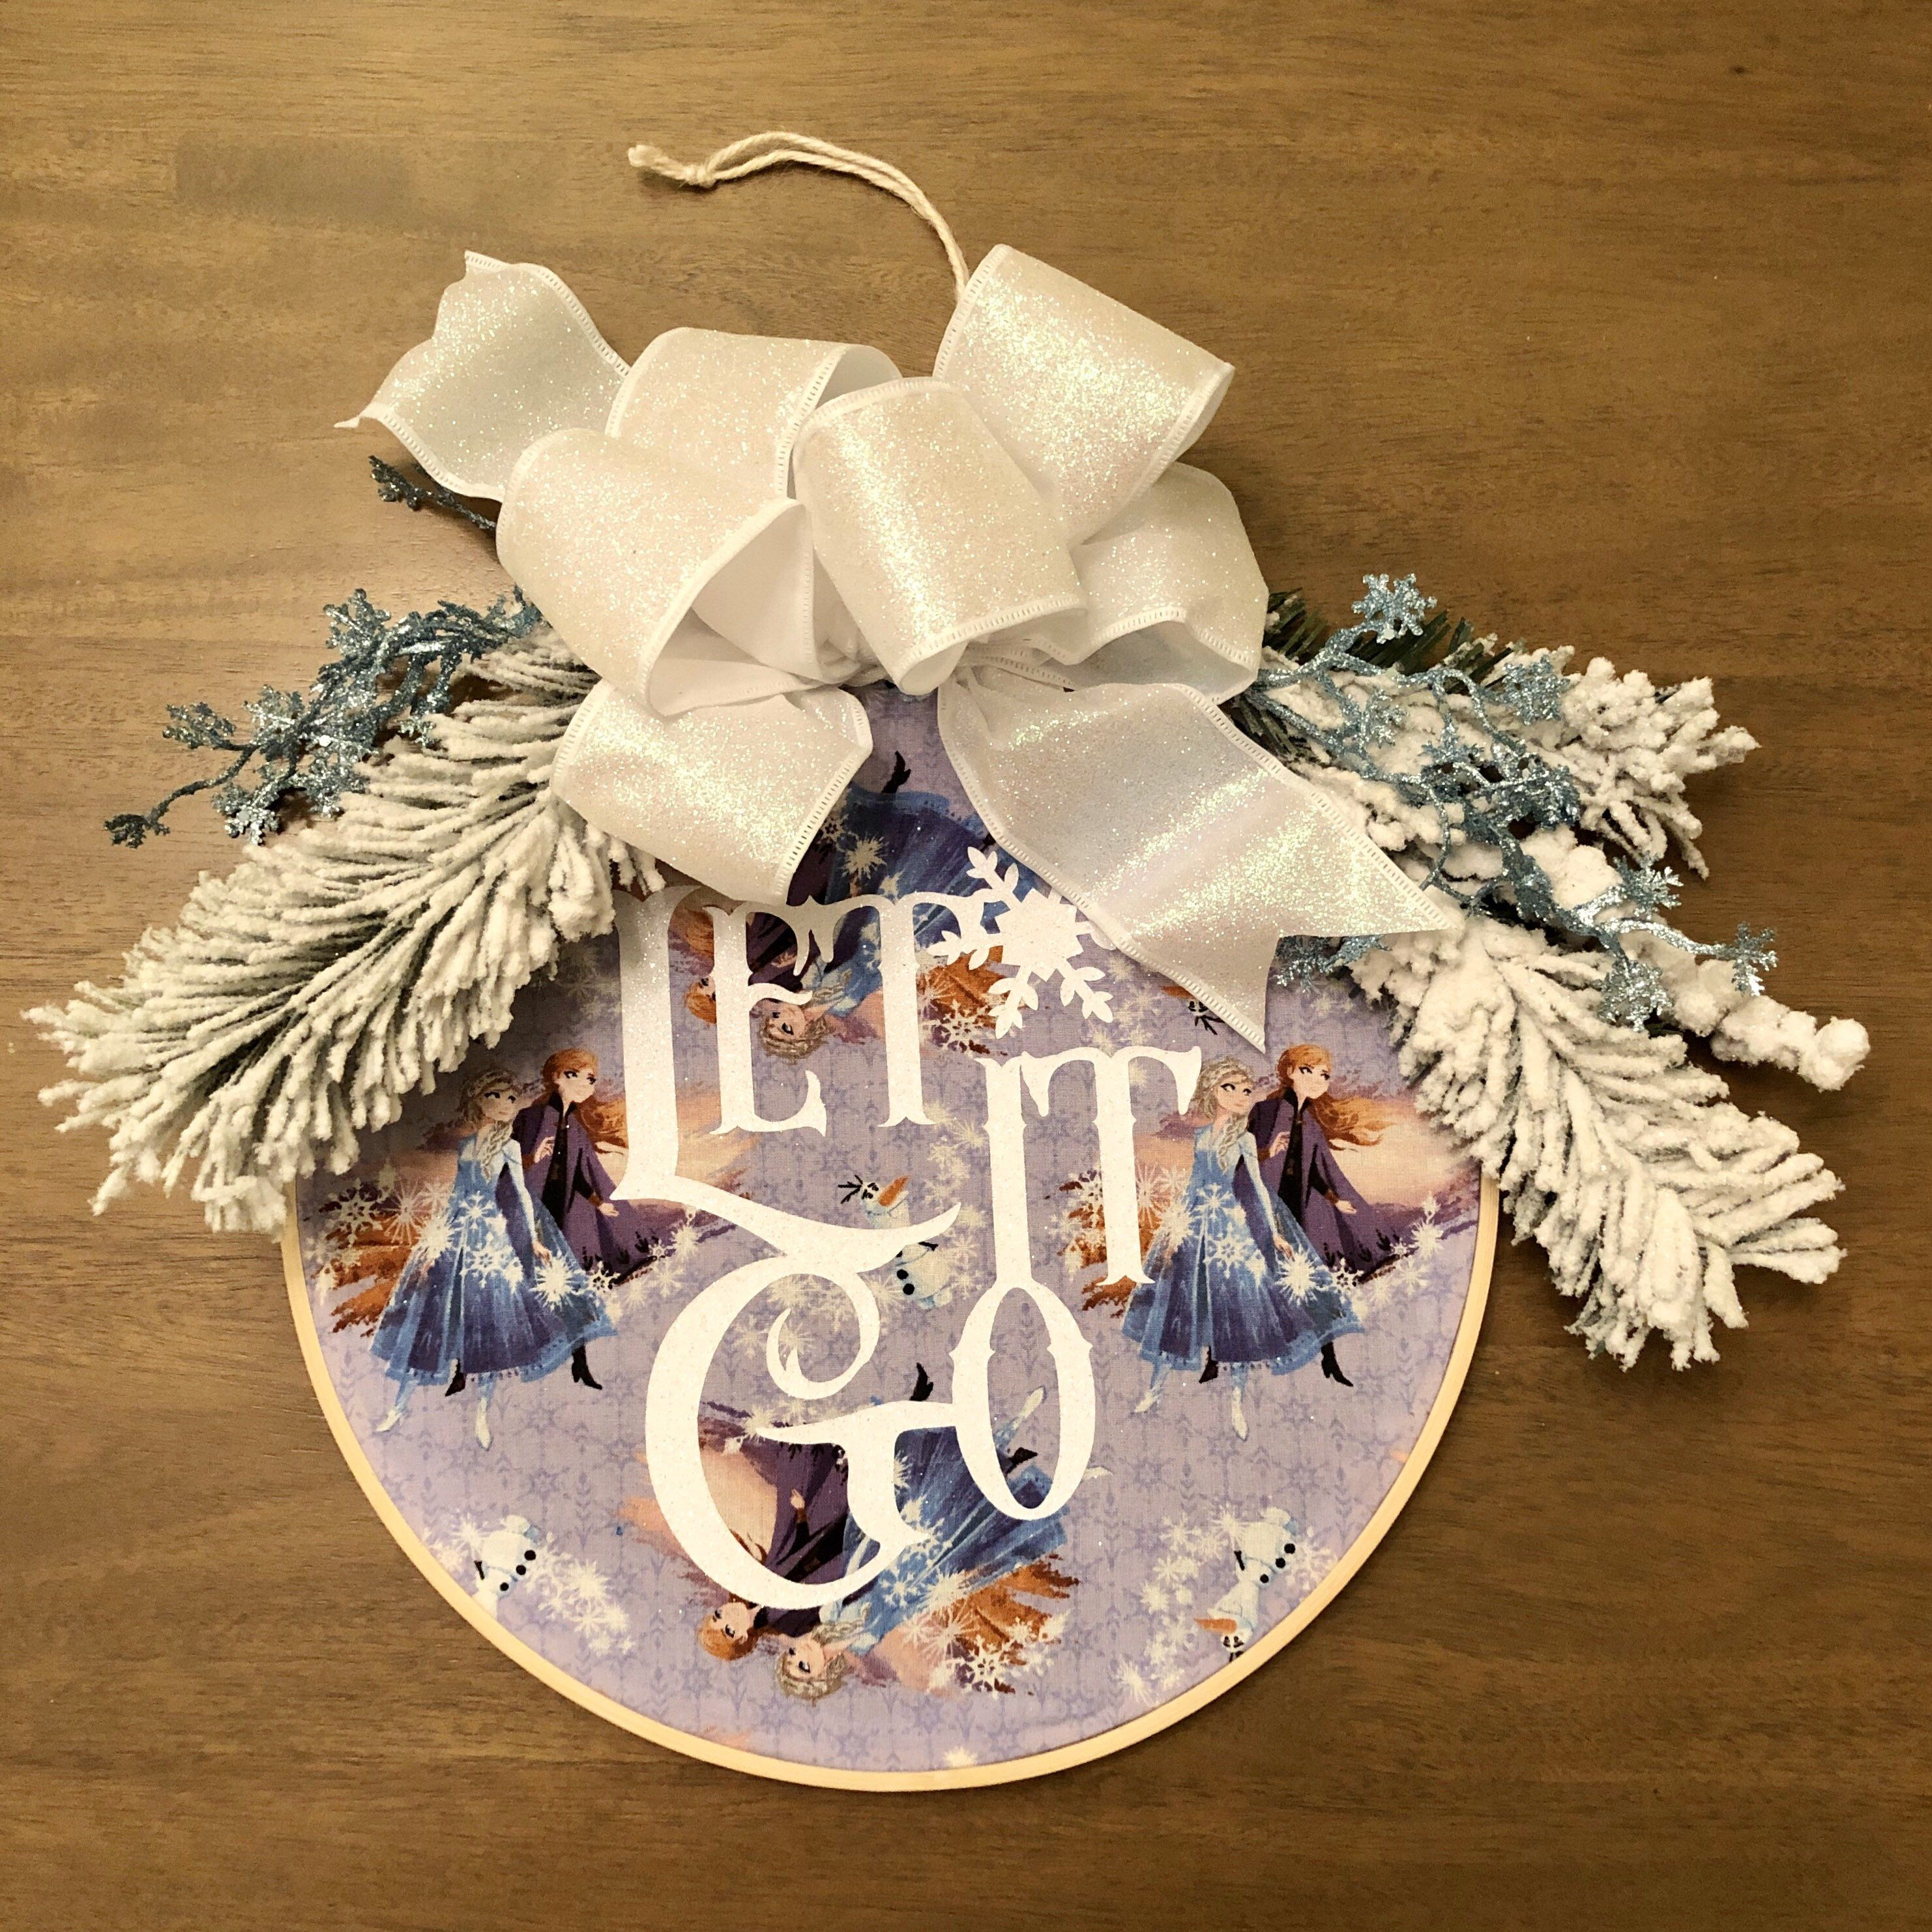 Photo of Christmas Buffalo Plaid, Let It Snow Hoop Wreath, Christmas Embroidery Hoop Wreath, Merry Christmas Hoop Wreath, Trending Now